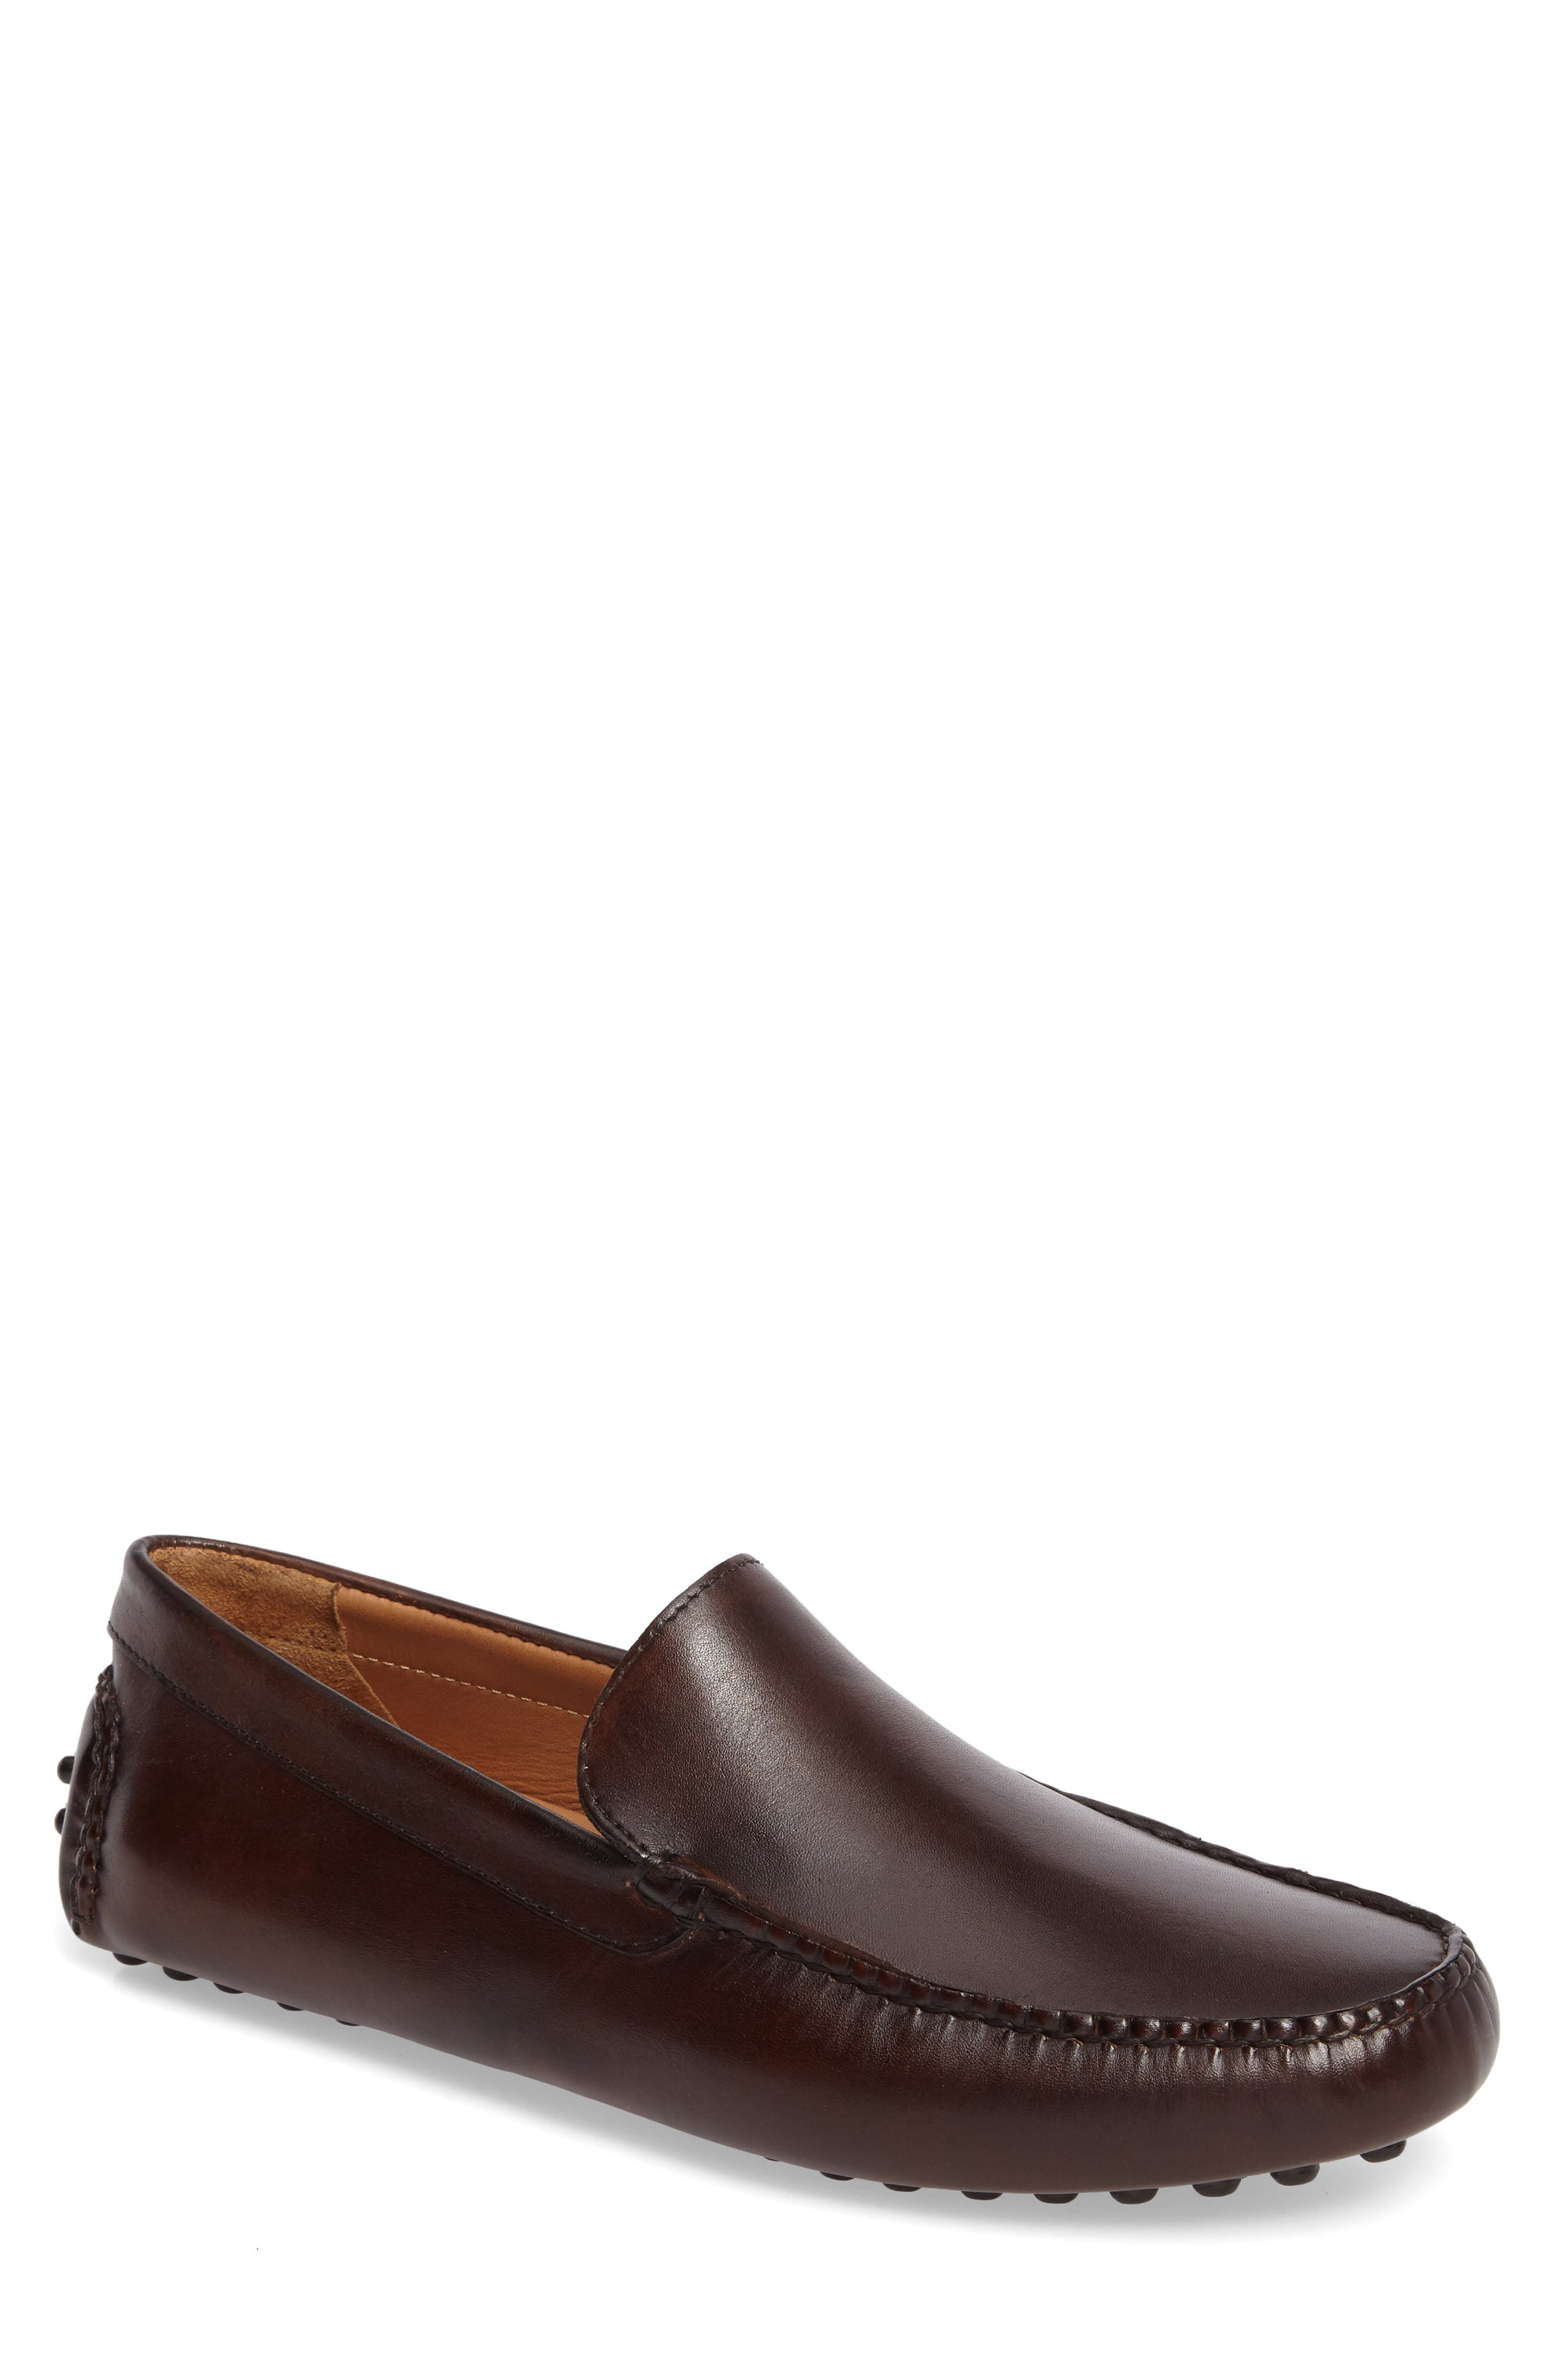 John W. Nordstrom® Cane Driving Shoe (Men)